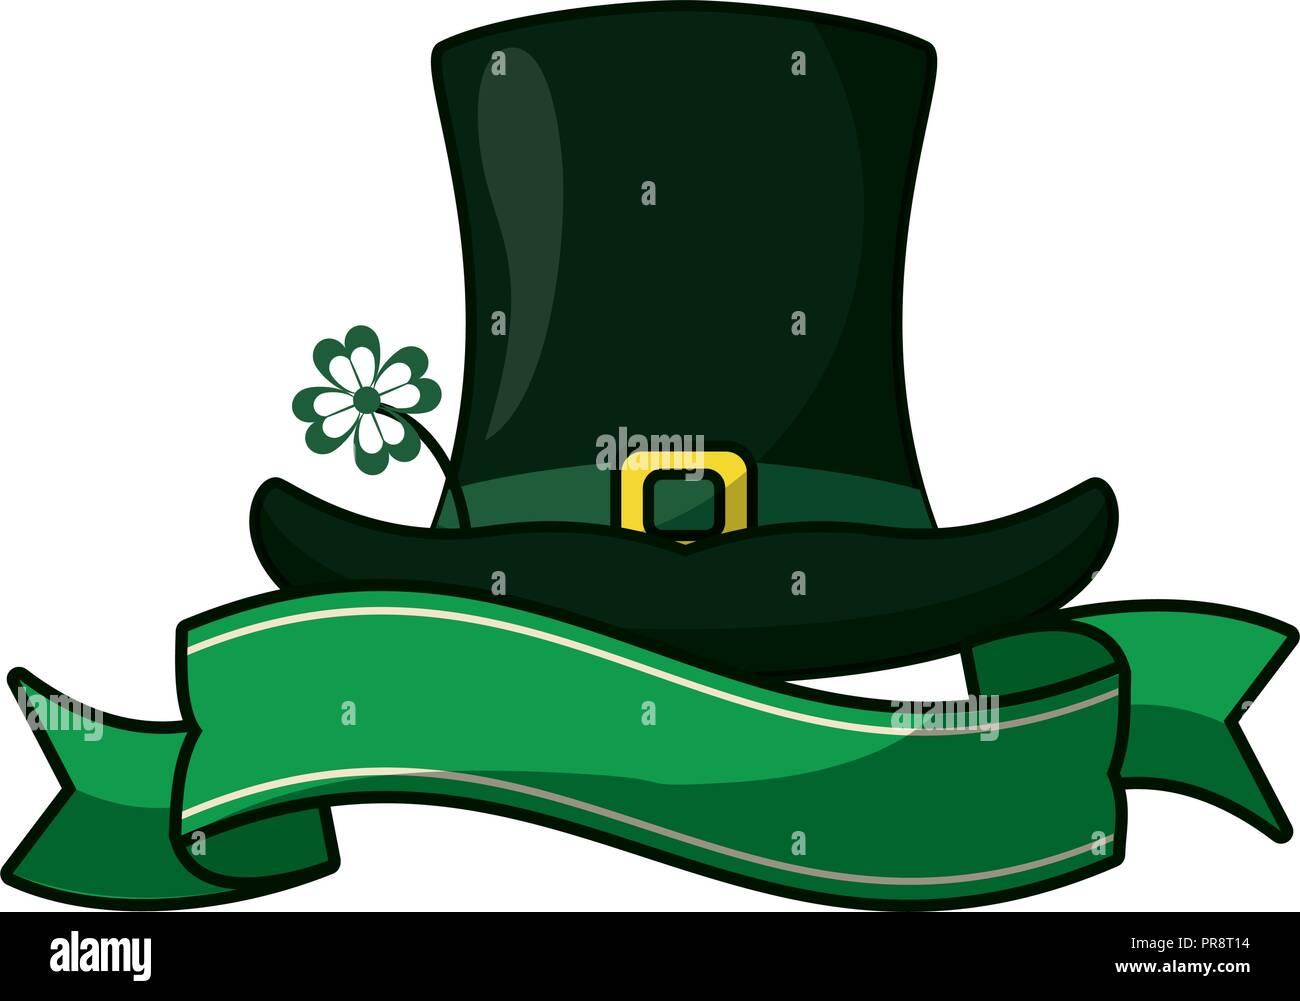 69f134662a0 Irish elf hat symbol Stock Vector Art   Illustration